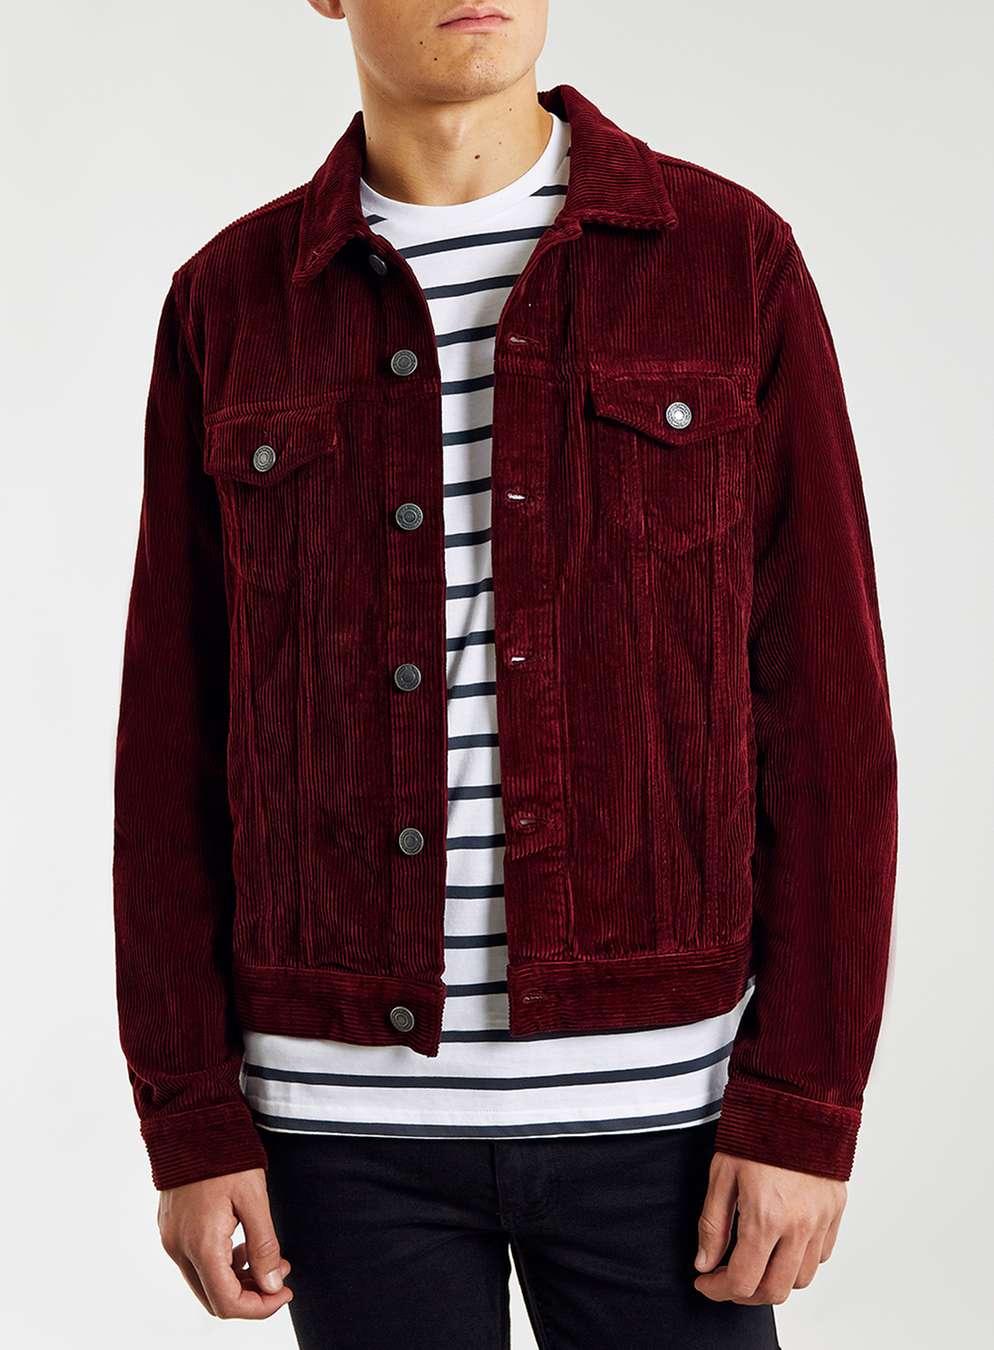 corduroy jacket red cord western jacket   topman rlzydin